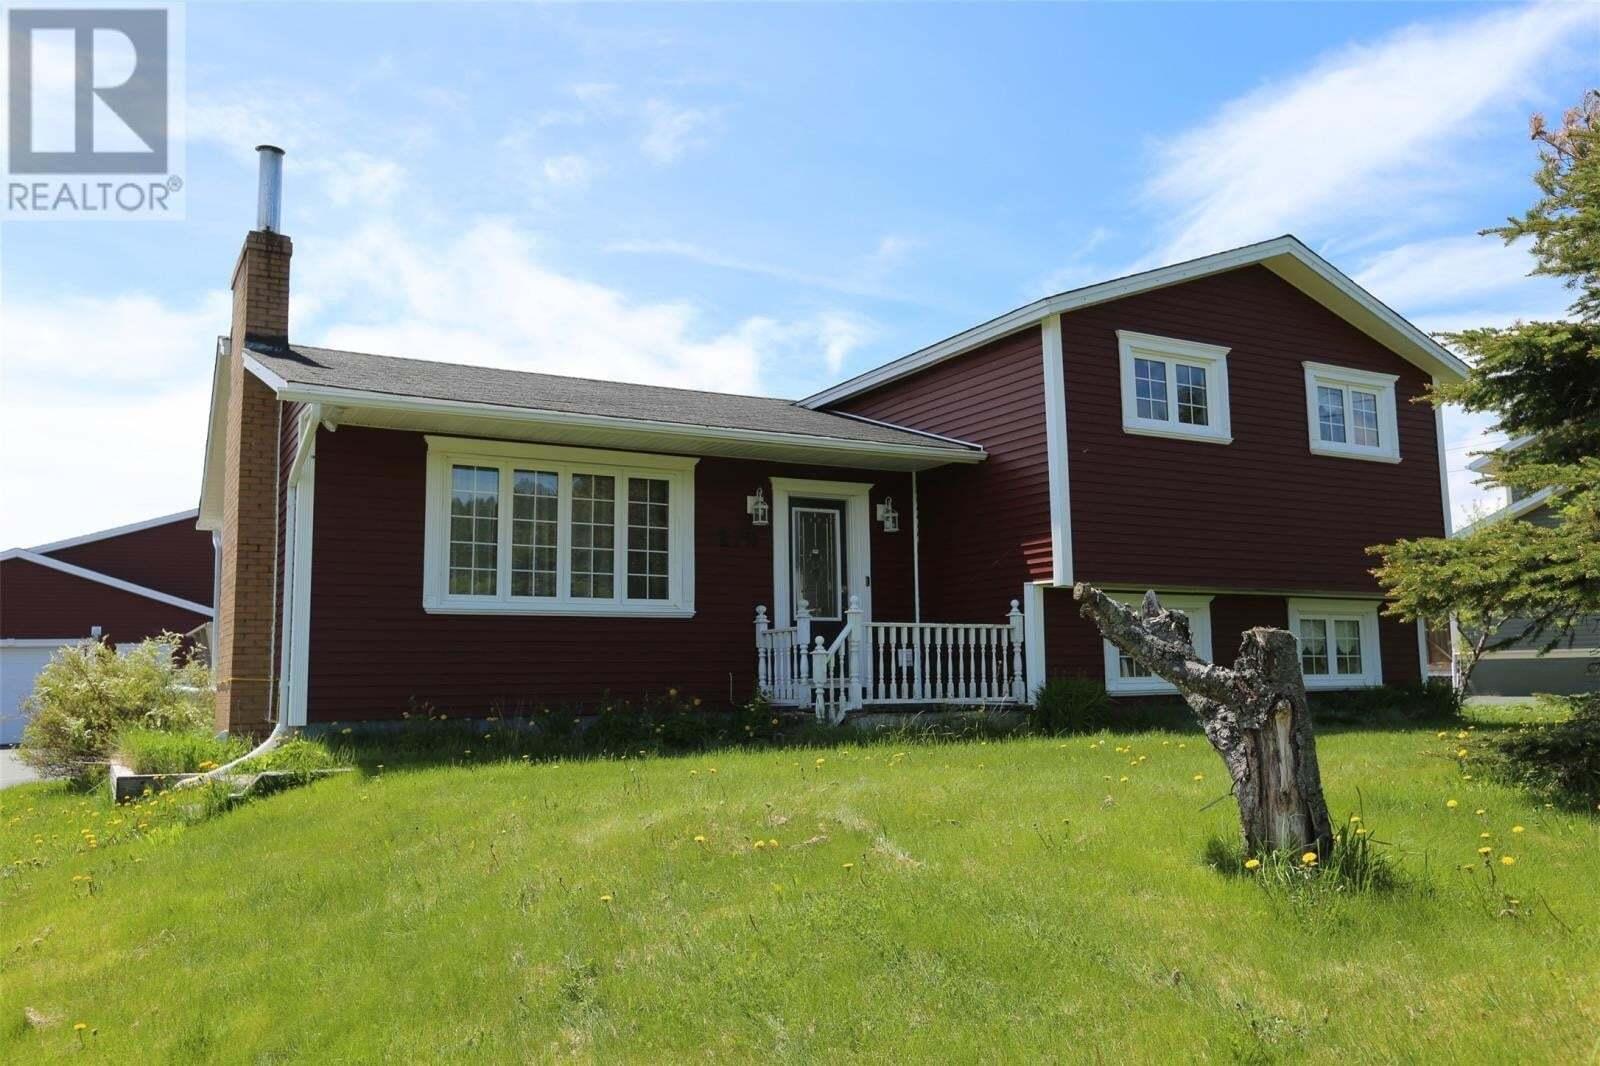 House for sale at 279 Indian Meal Line Torbay Newfoundland - MLS: 1216018